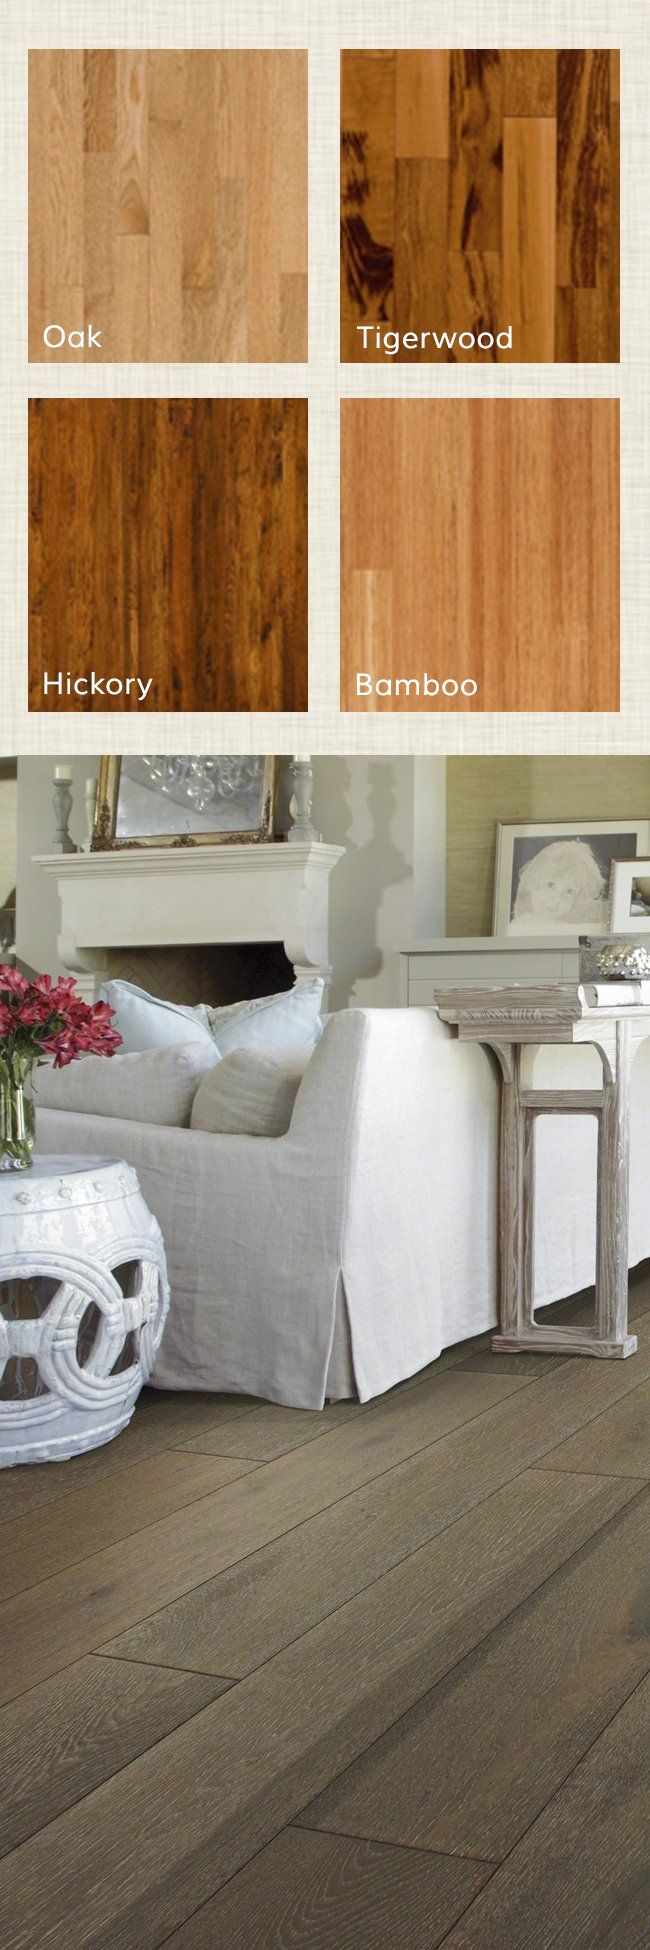 best dream house images on pinterest bedroom ideas master